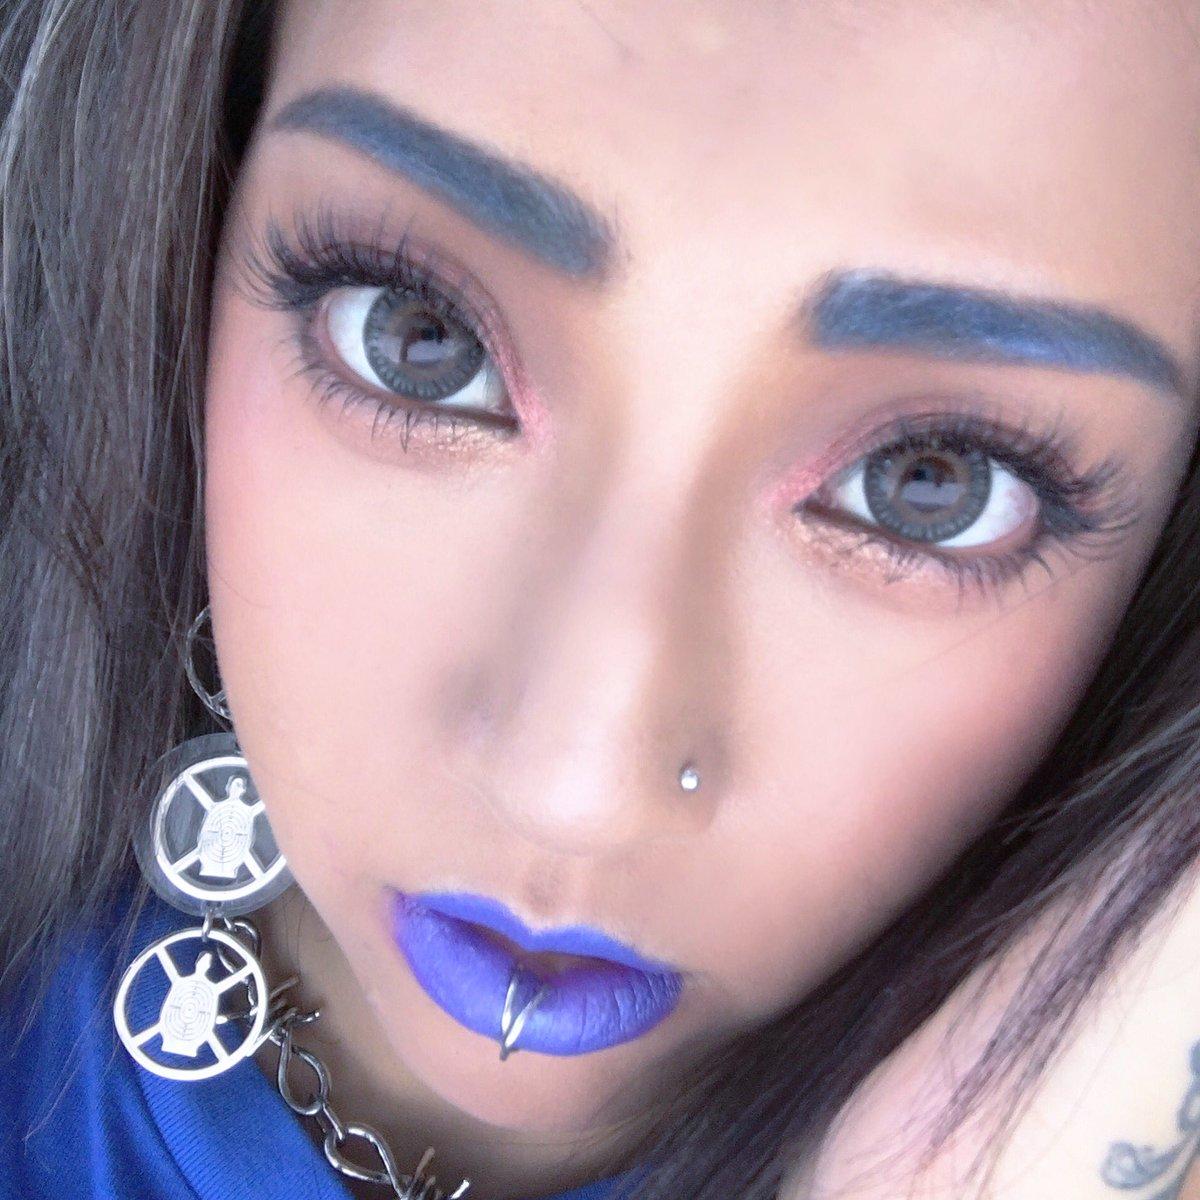 got #eyelashextensions done #flawless by @malibu_oyama <br>http://pic.twitter.com/ZQcDaAbku8